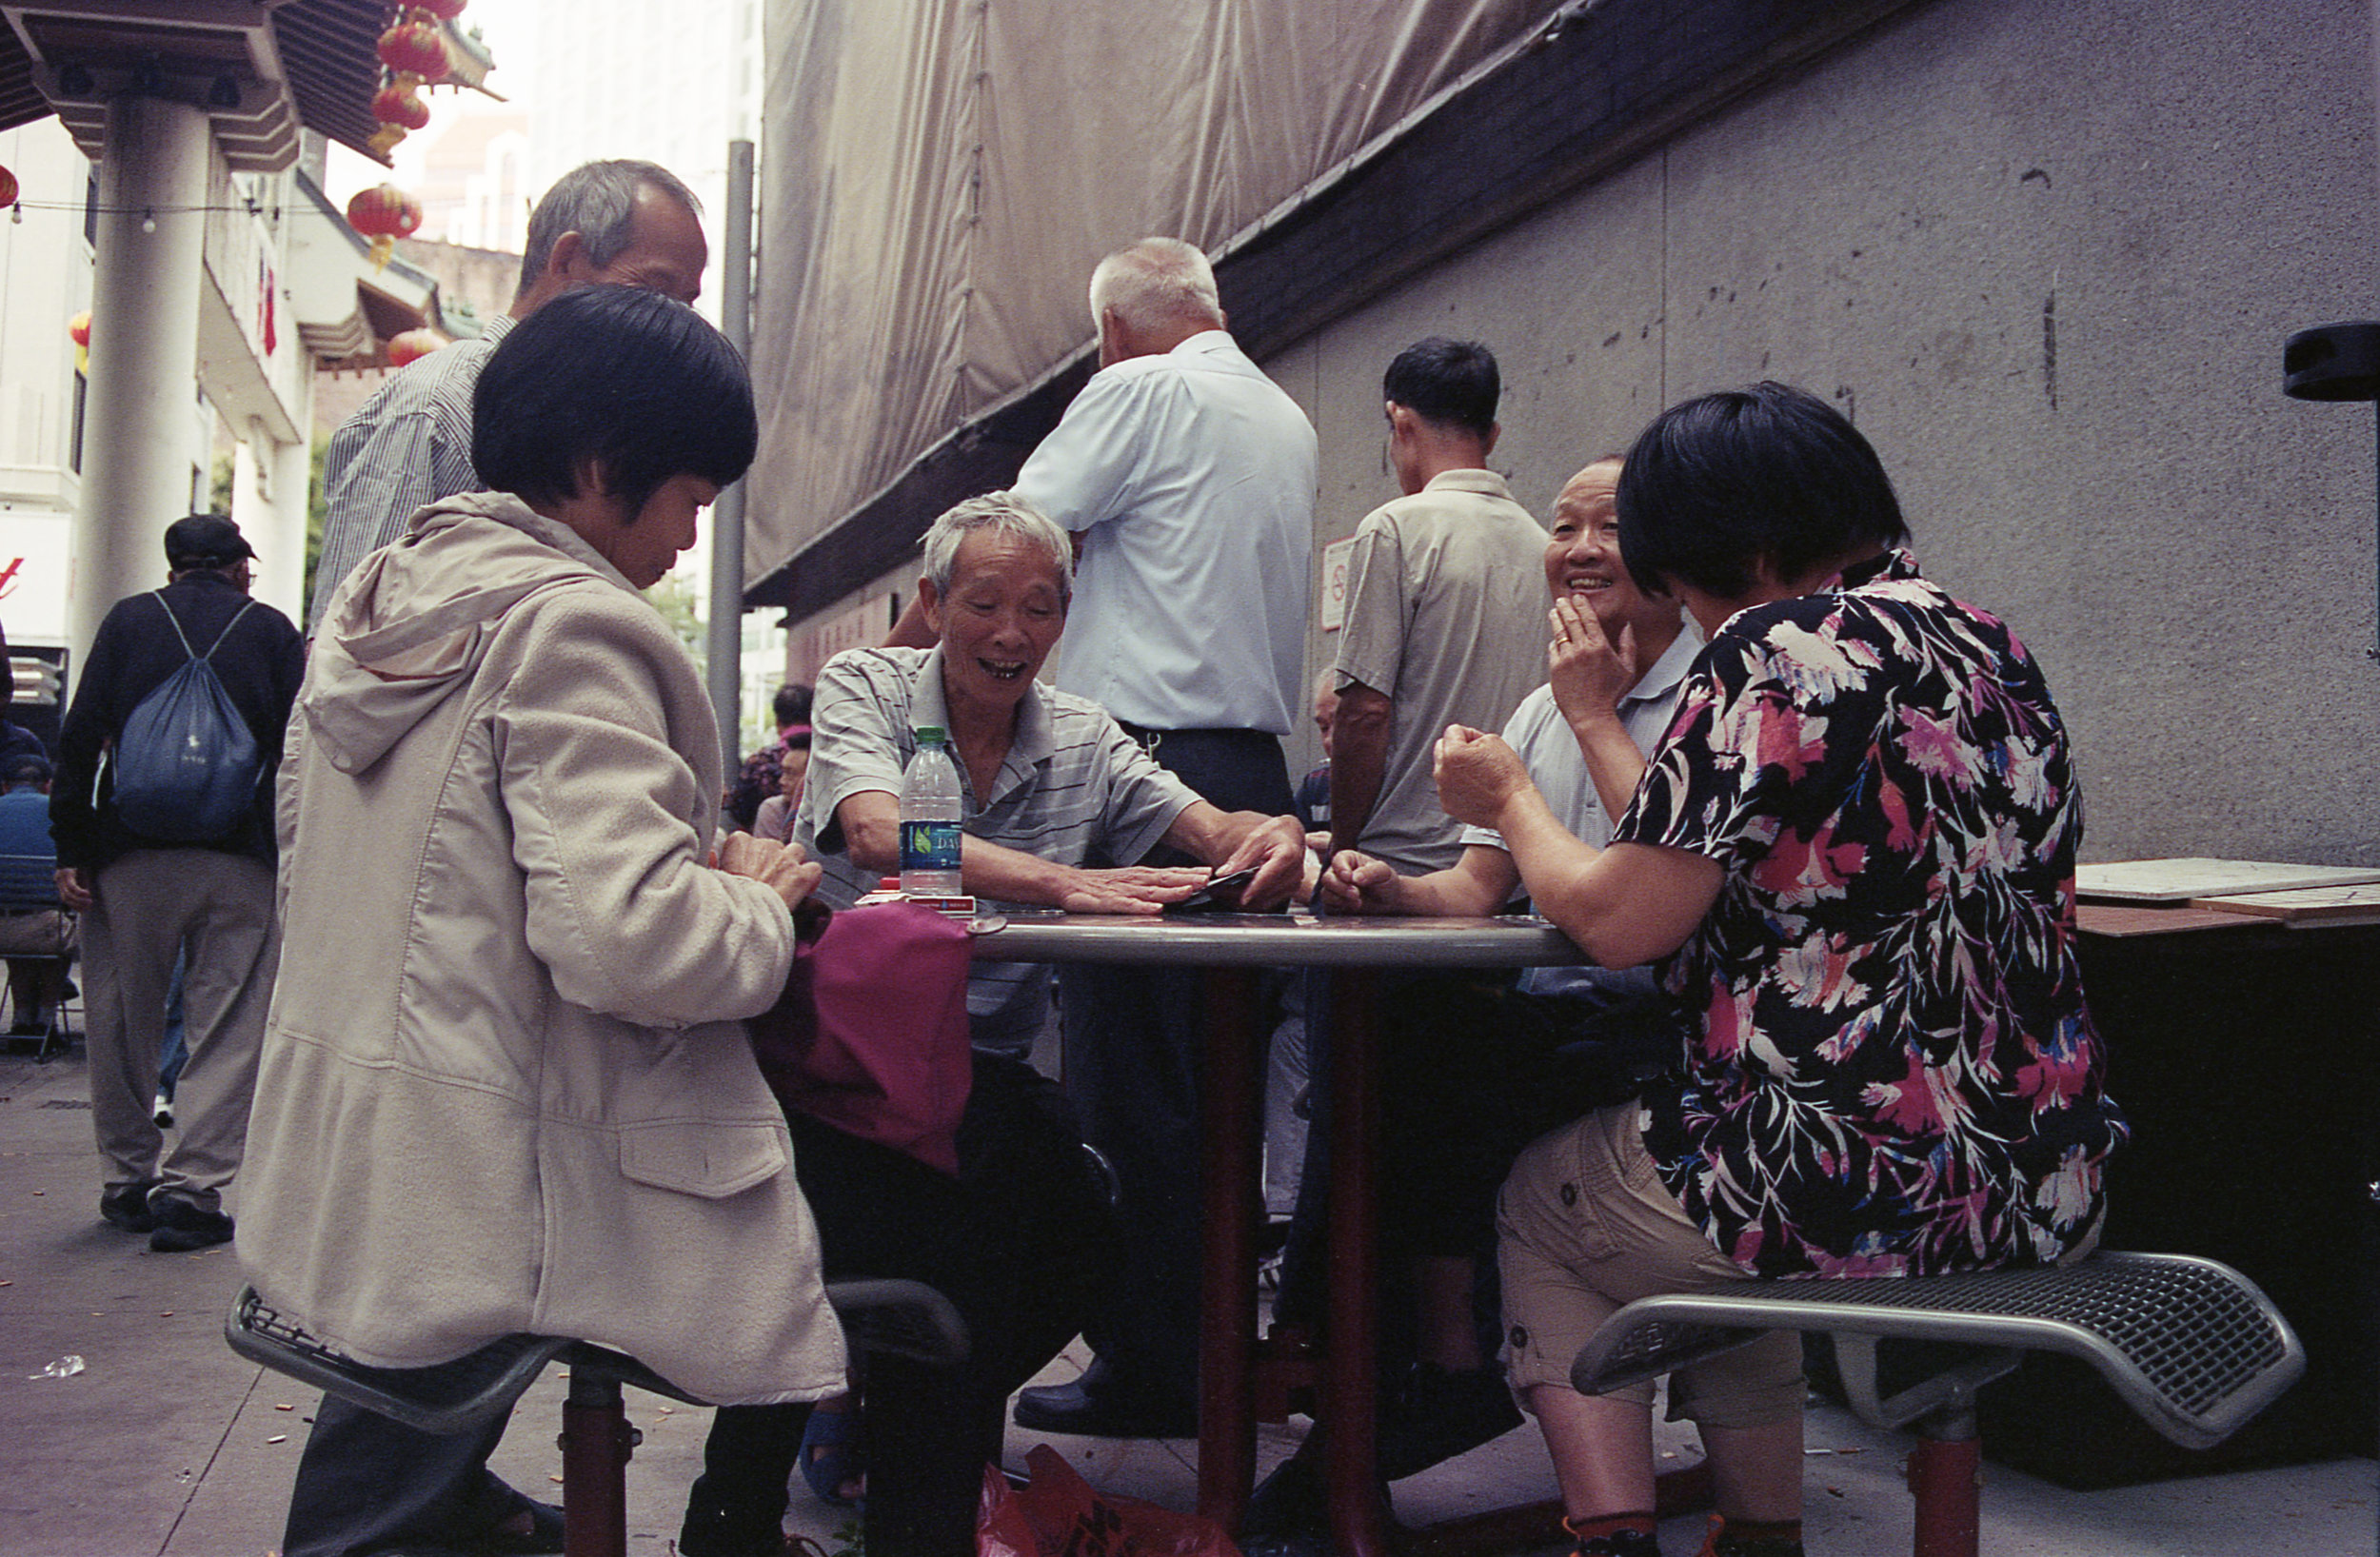 20180819_Chinatown_034edit.jpg